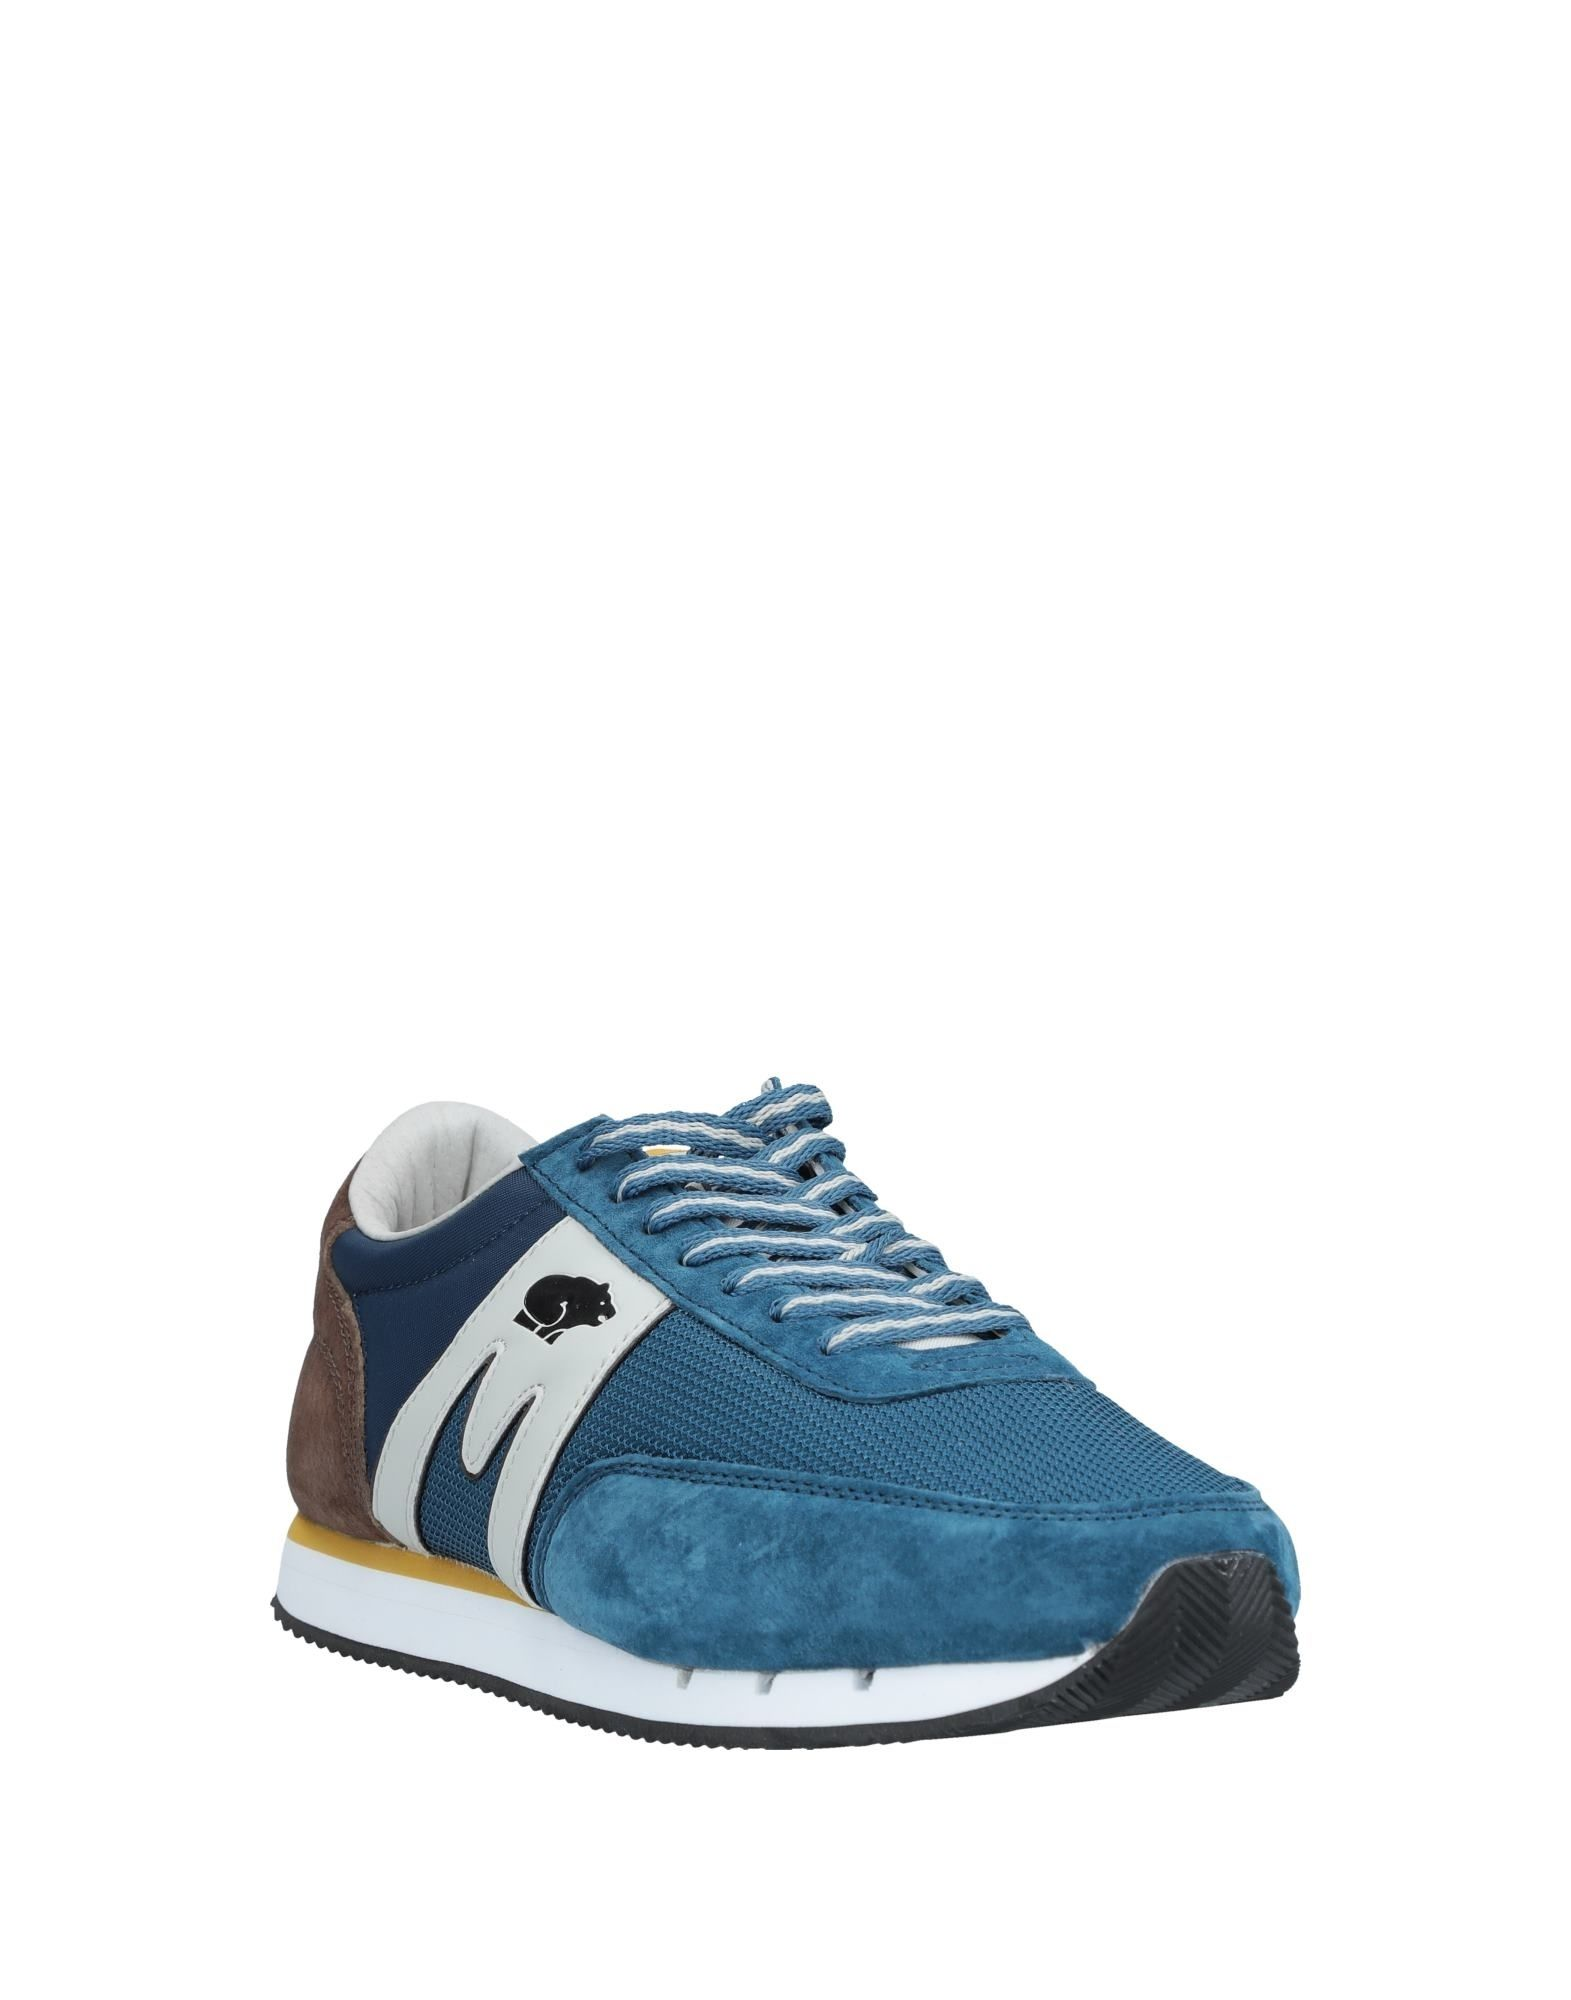 Rabatt echte  Schuhe Karhu Sneakers Herren  echte 11533385VS f04fda